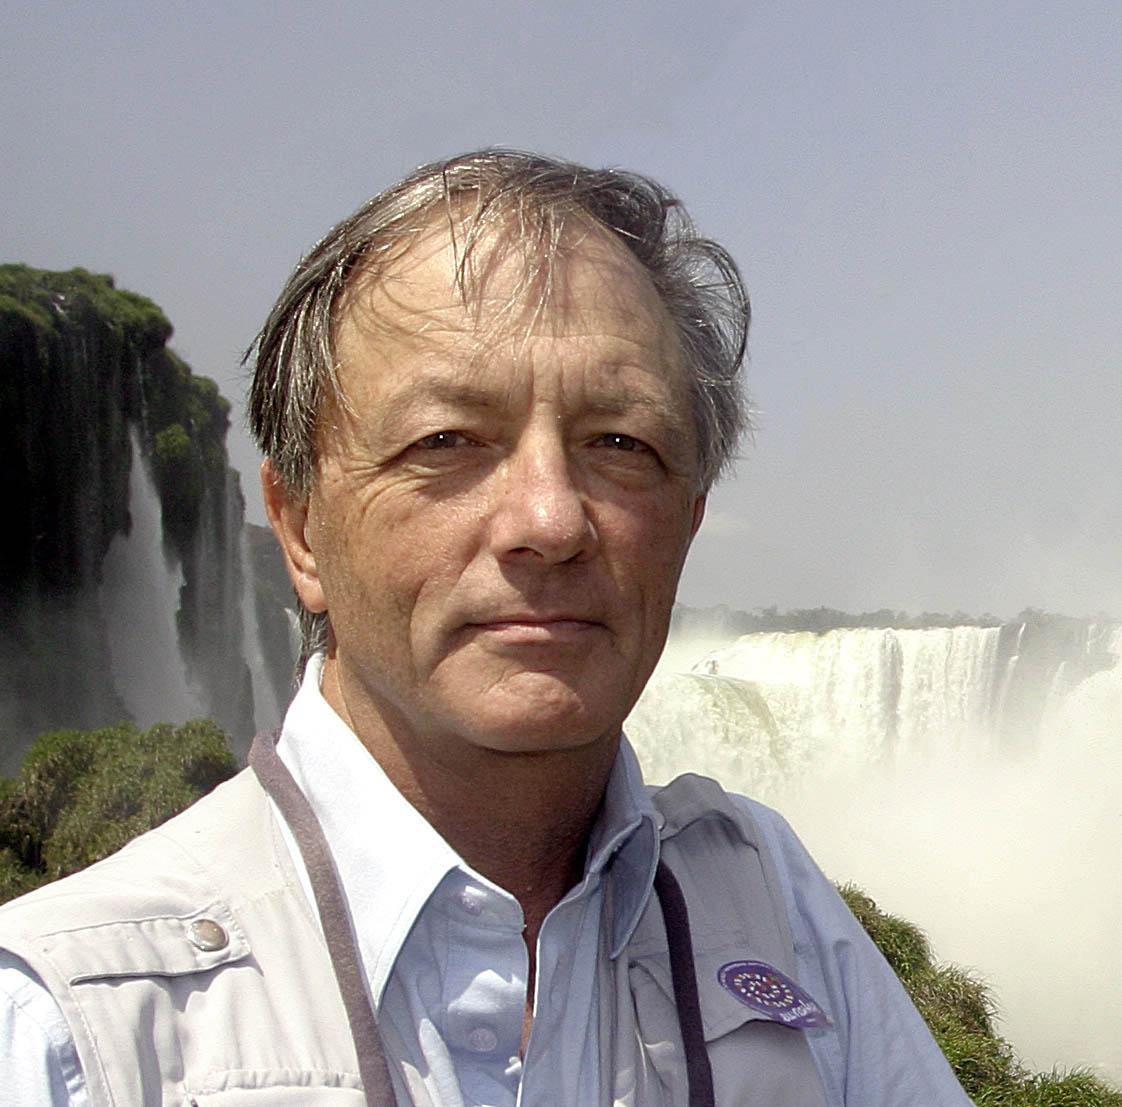 Author George Miller